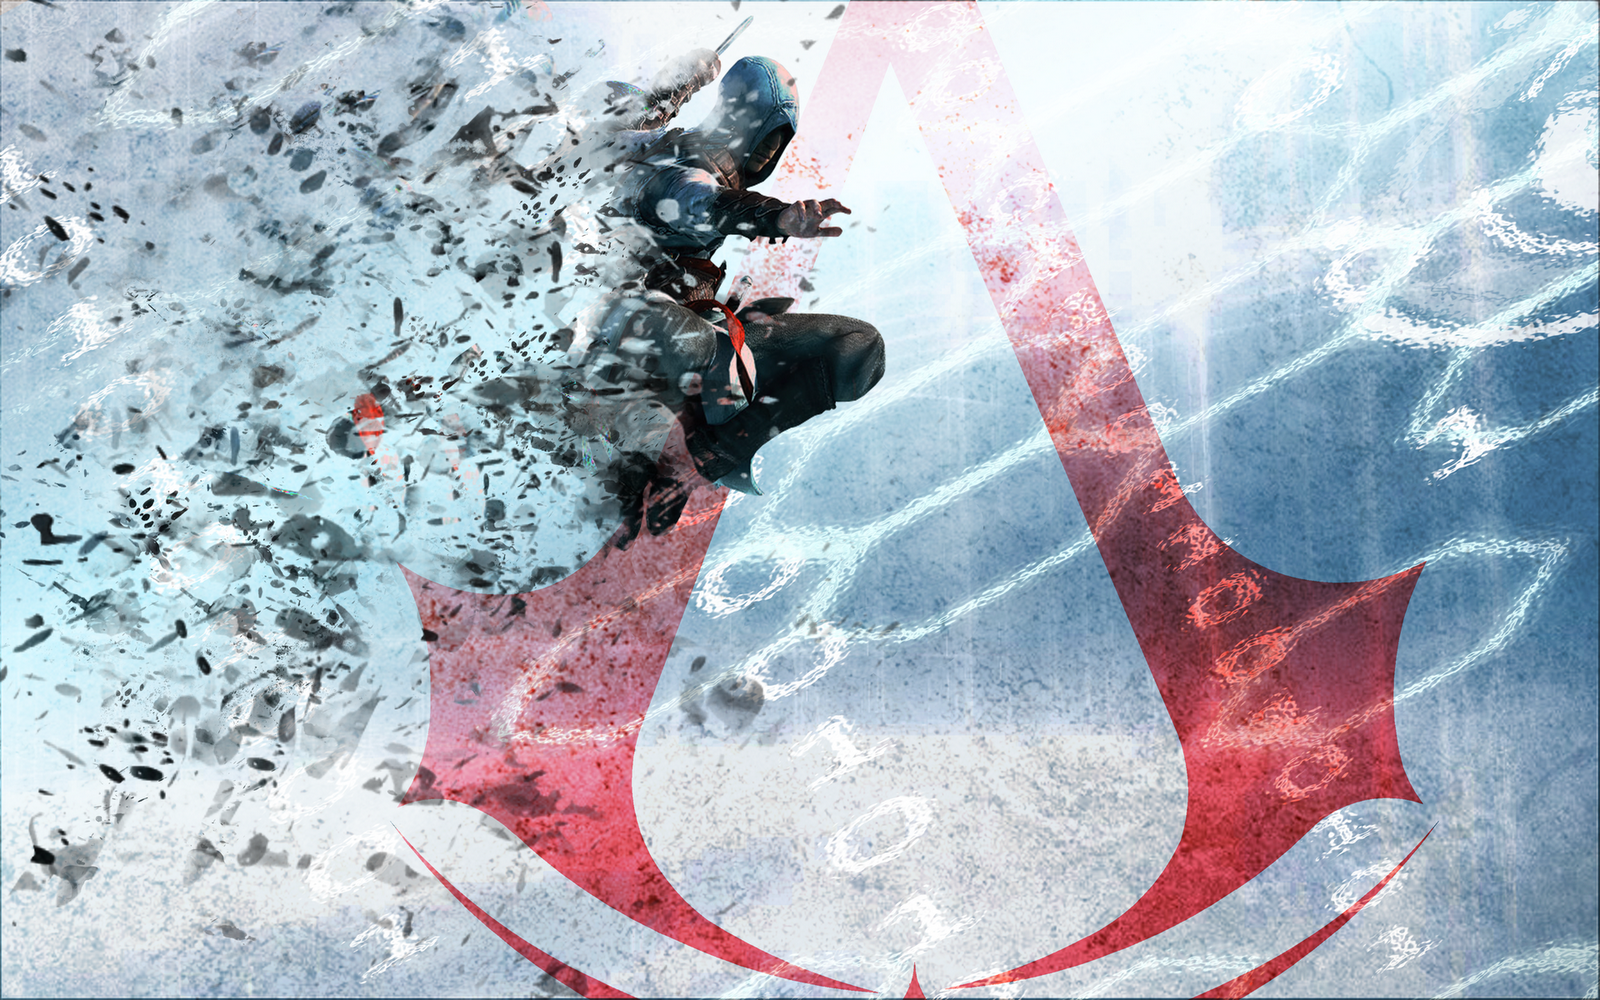 Assassin Creed HD Wallpaper 1080p PiCsHoliC 1600x1000